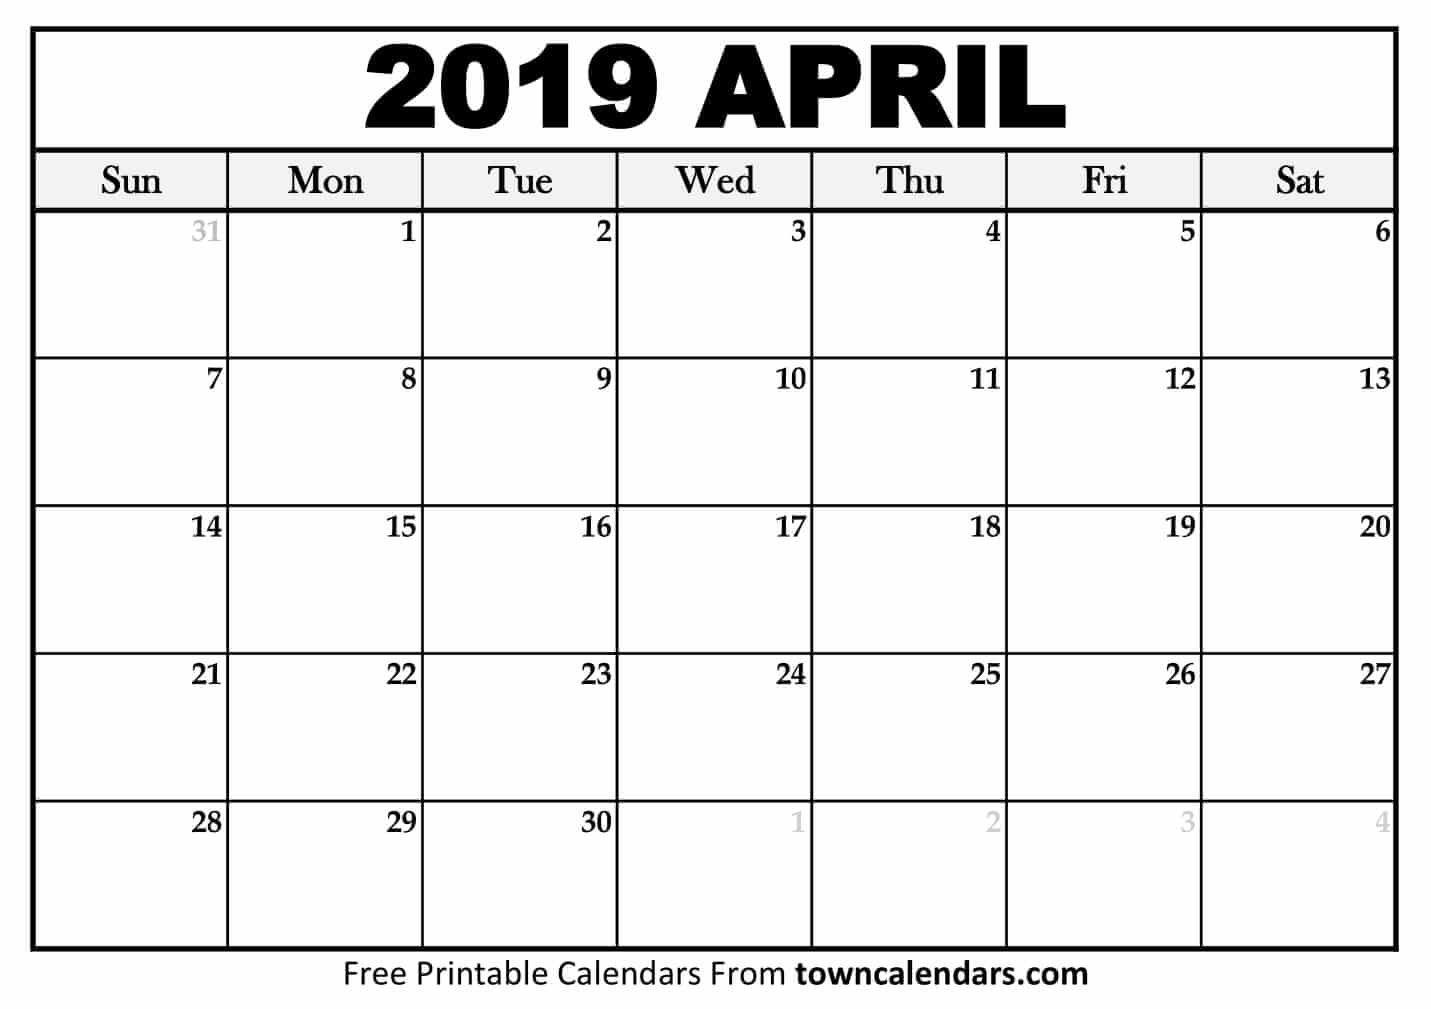 Printable April 2019 Calendar - Towncalendars Calendar 2019 April Printable